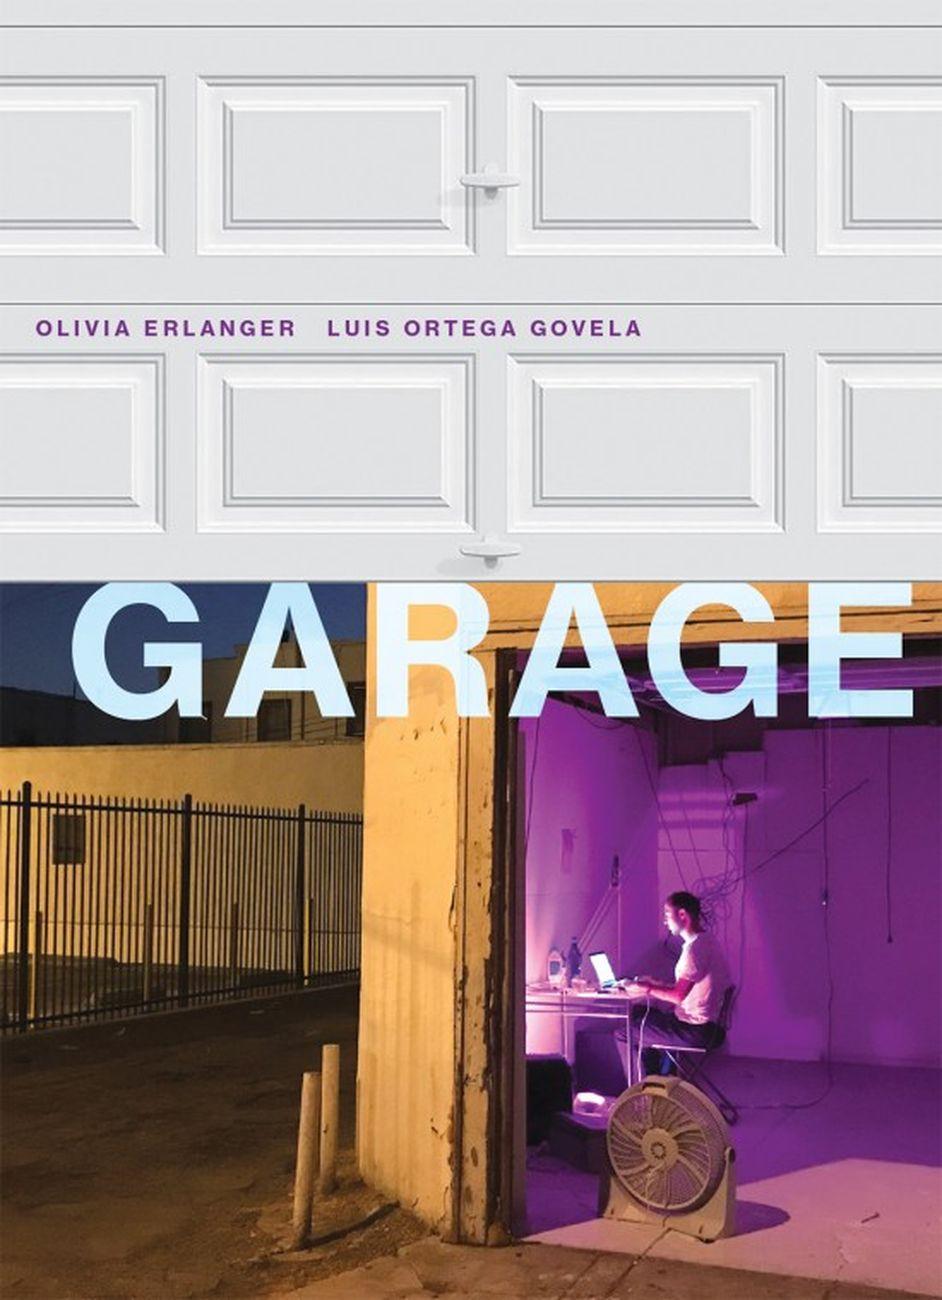 Olivia Erlanger & Luis Ortega Govela ‒ Garage (The Mit Press, Cambridge (Mass.) 2018). Cover